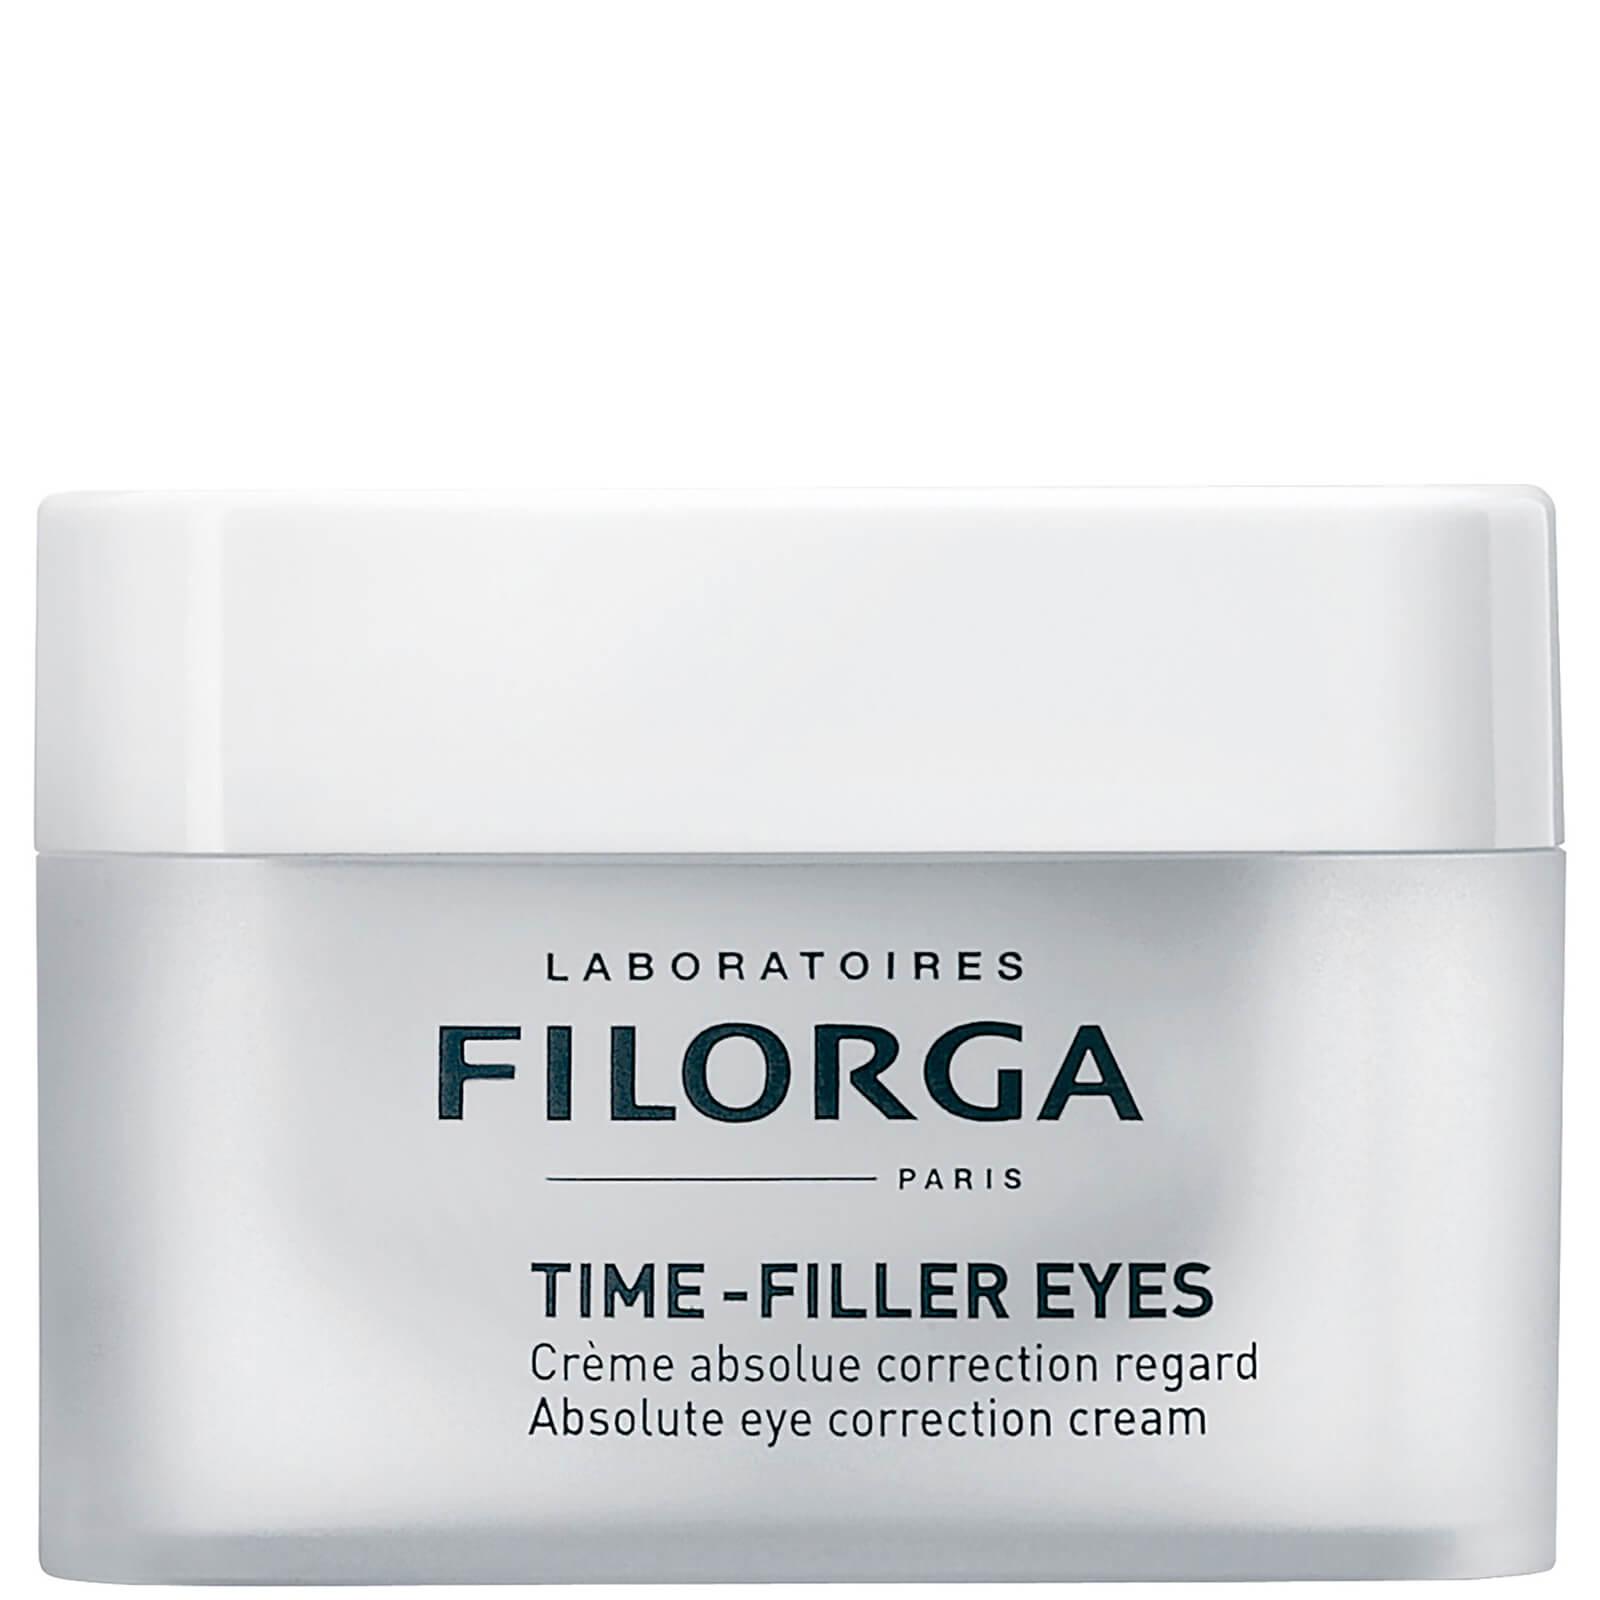 【雙12】Lookfantastic:Filorga 菲洛嘉 360雕塑眼霜、逆齡眼霜